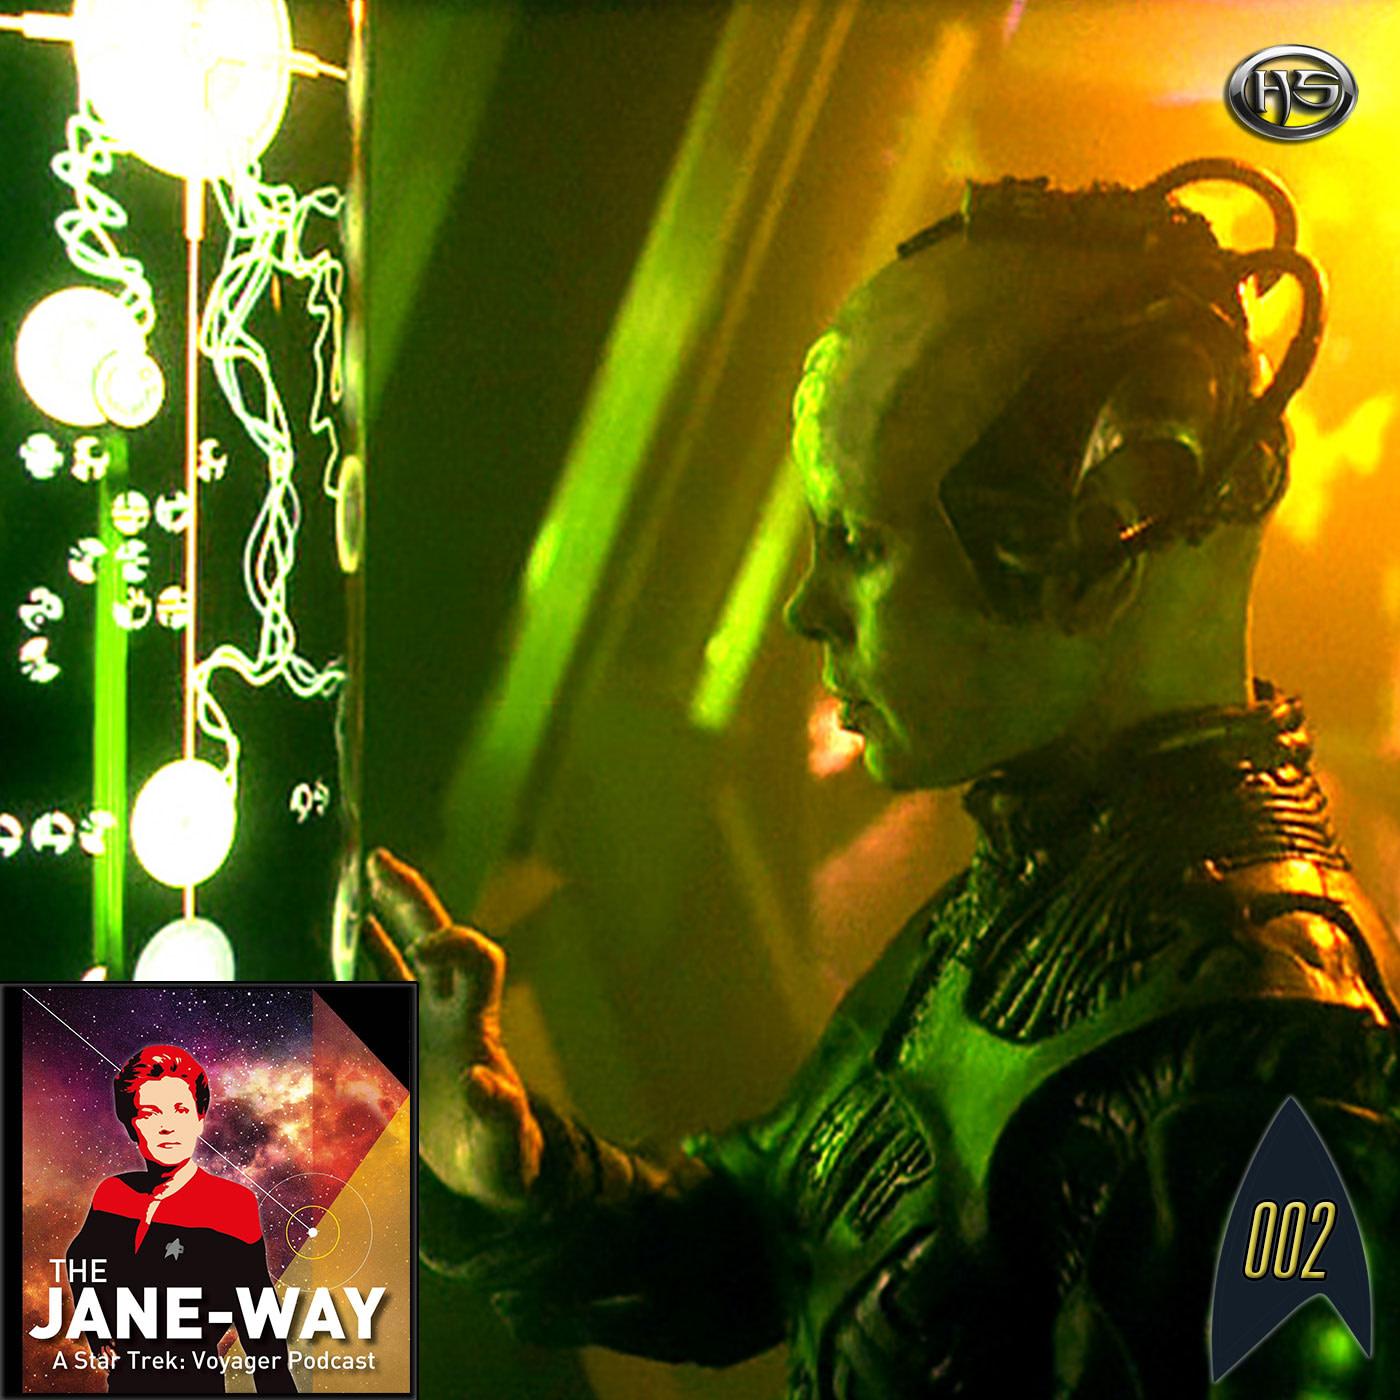 The Jane-Way Episode 2